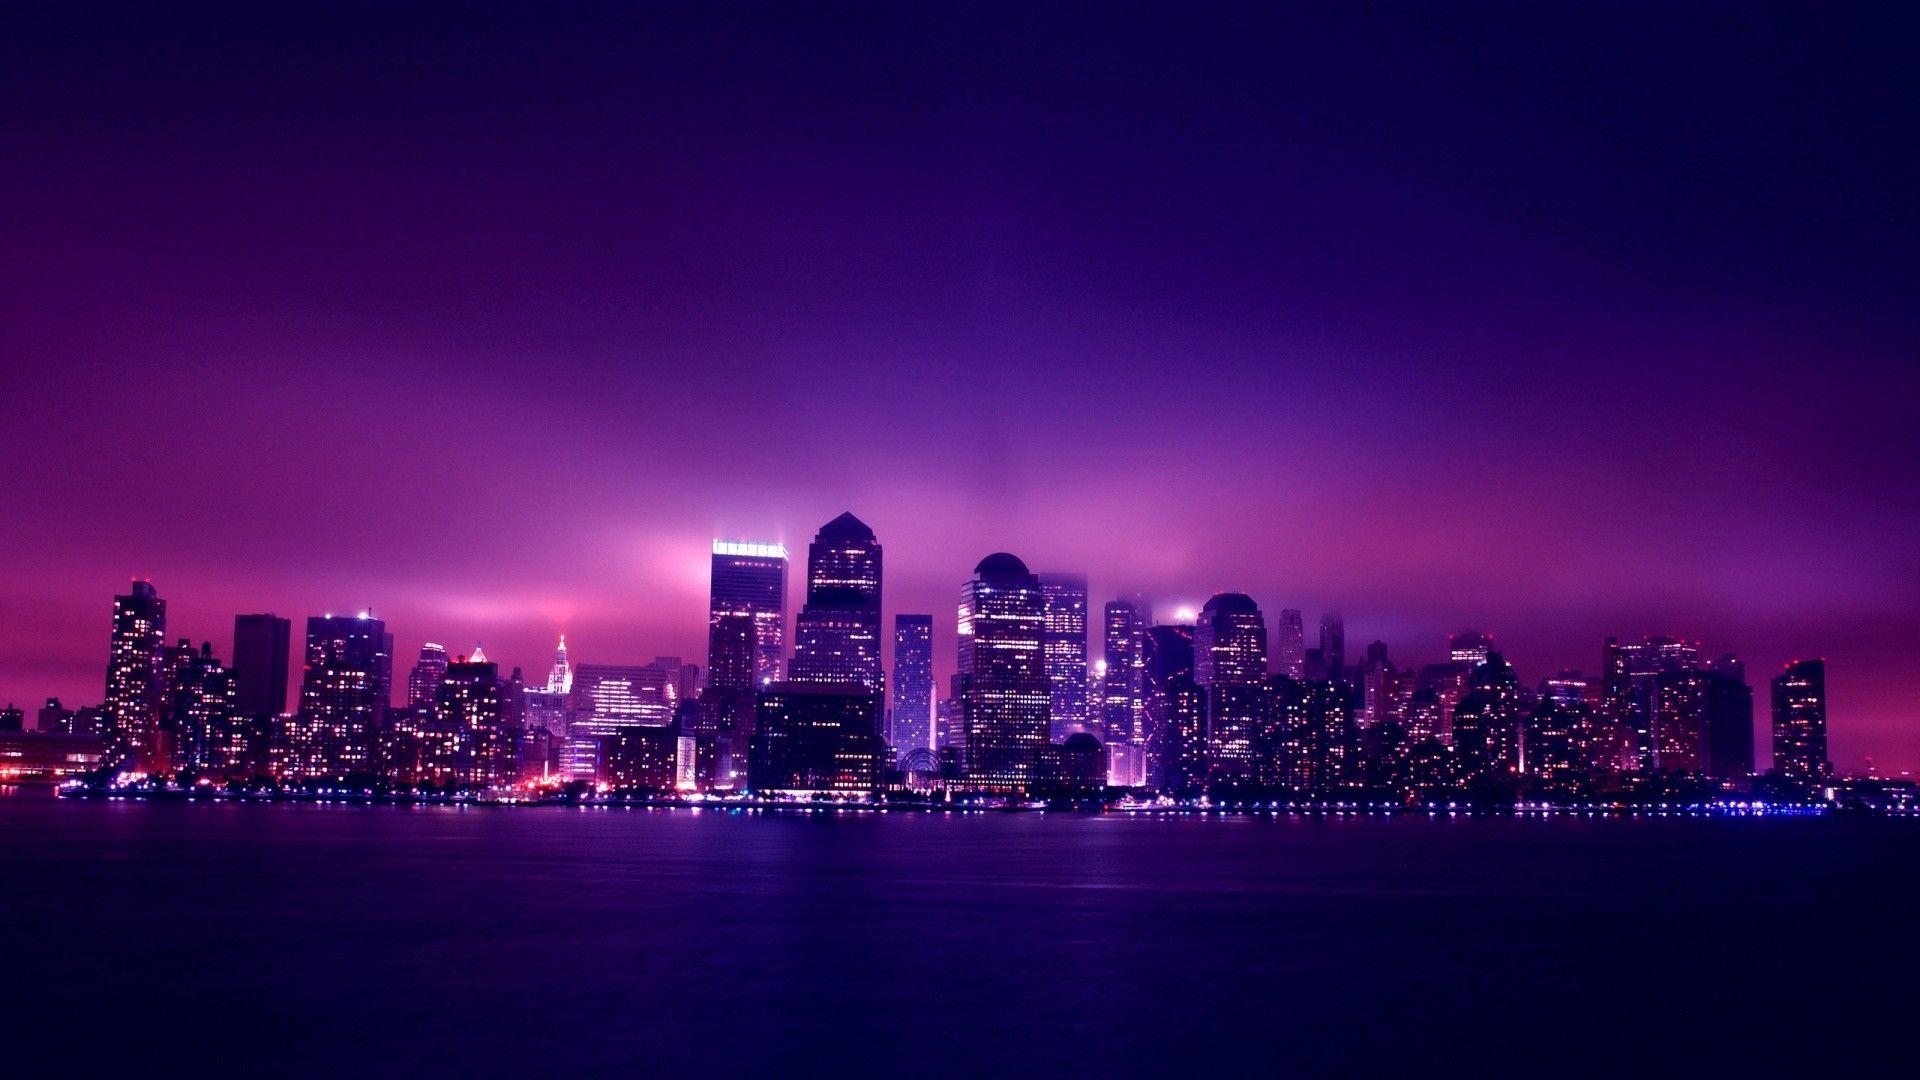 Wallpaper For Pc Purple